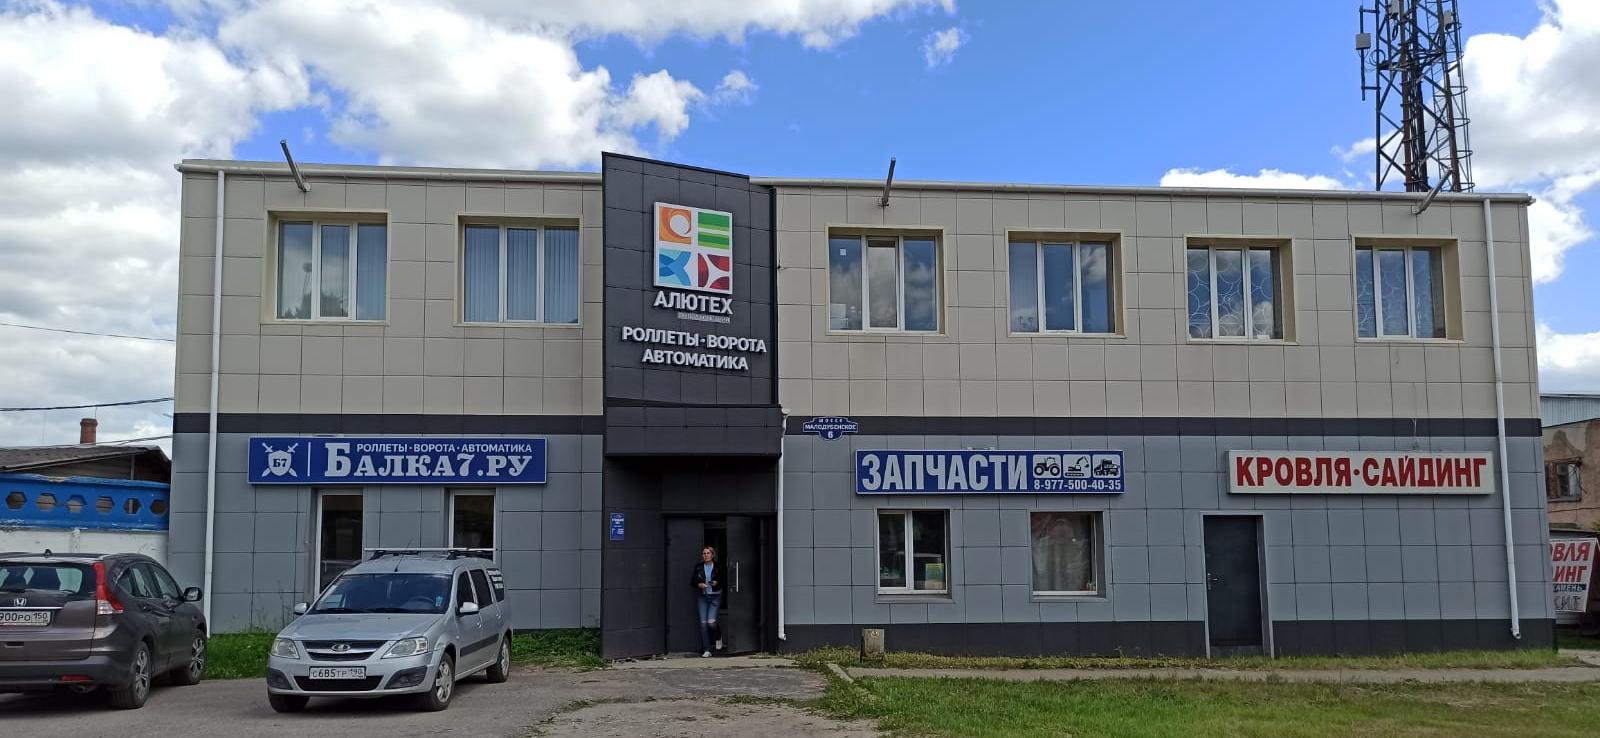 ofis._cut-photo.ru